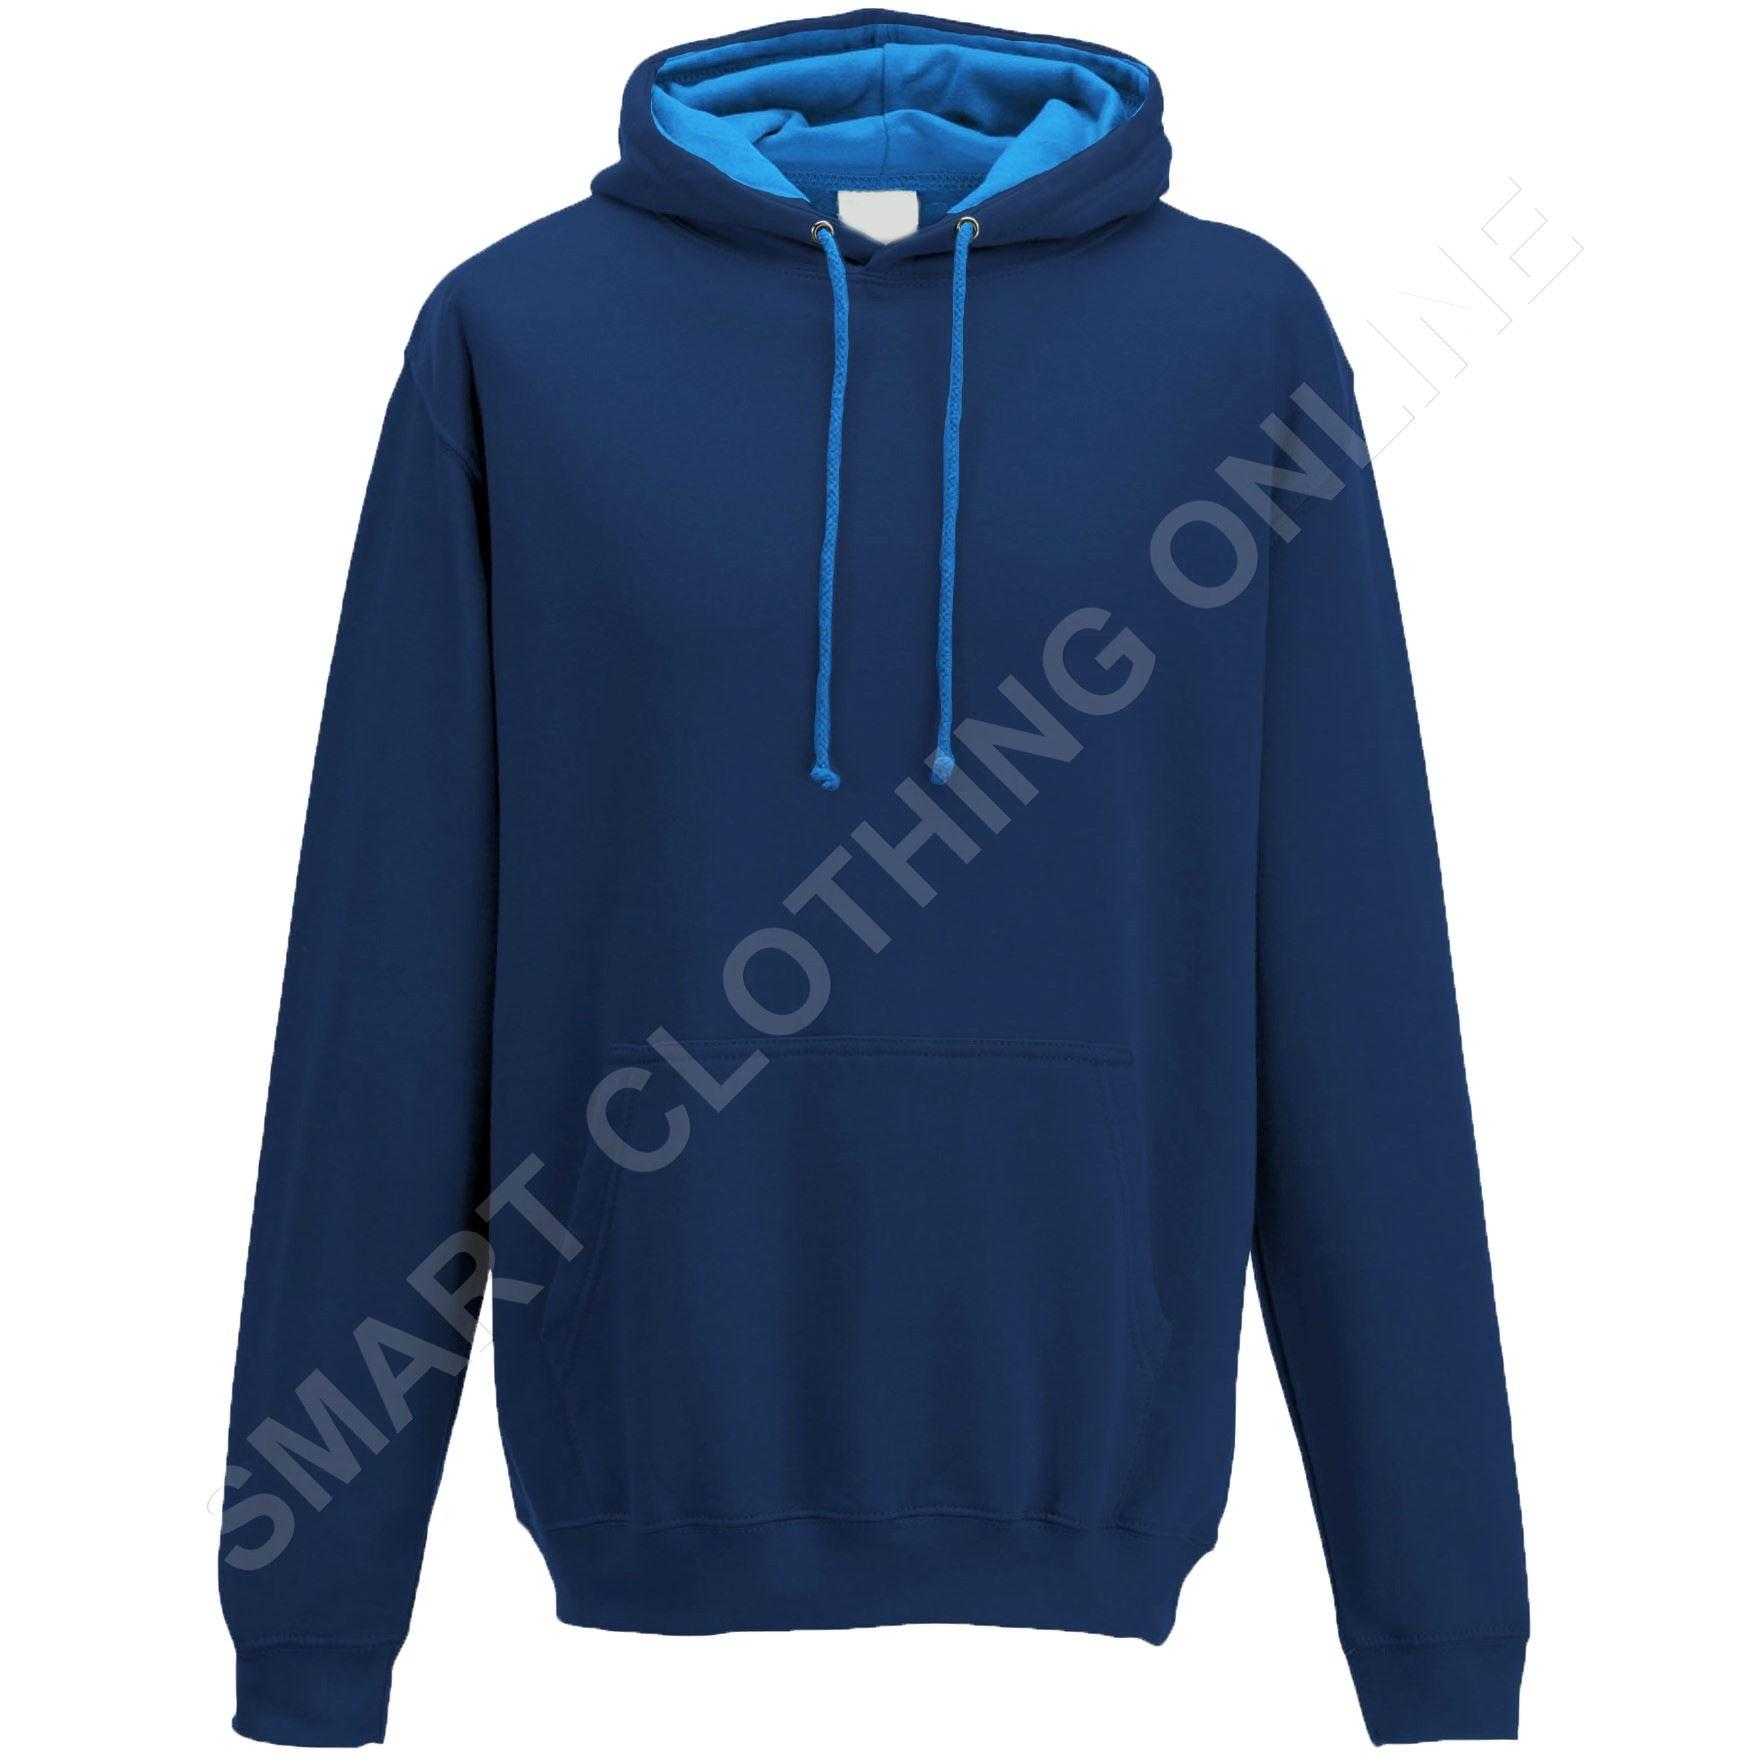 Xxl hoodies